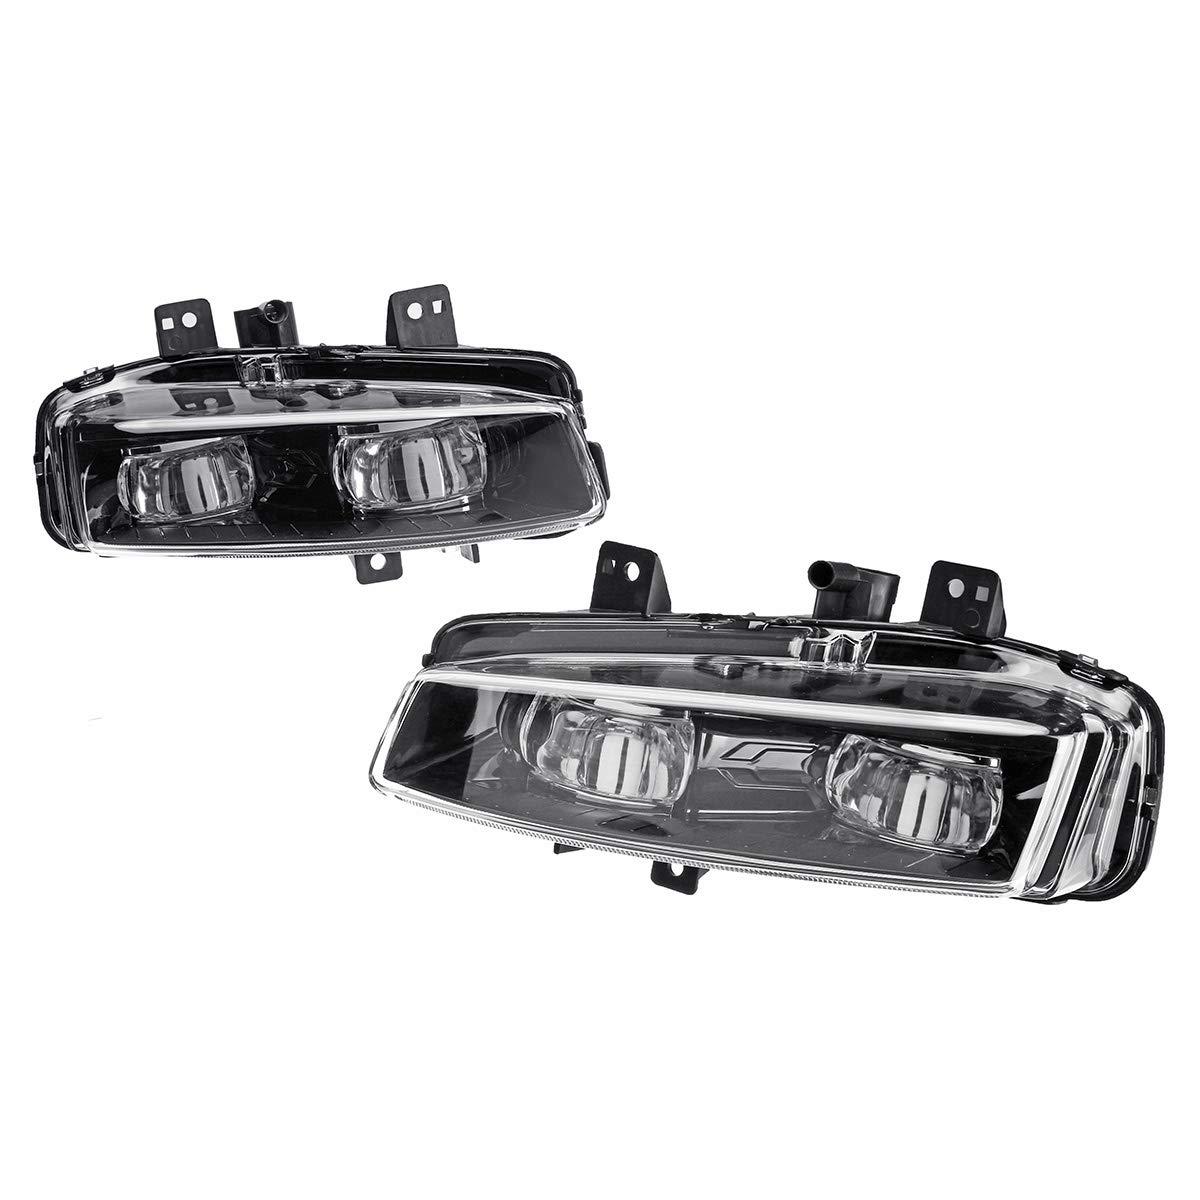 Kungfu Mall Car LED Front Bumper Fog Lights White Lamp for Range Rover Evoque Dynamic 2011-2016